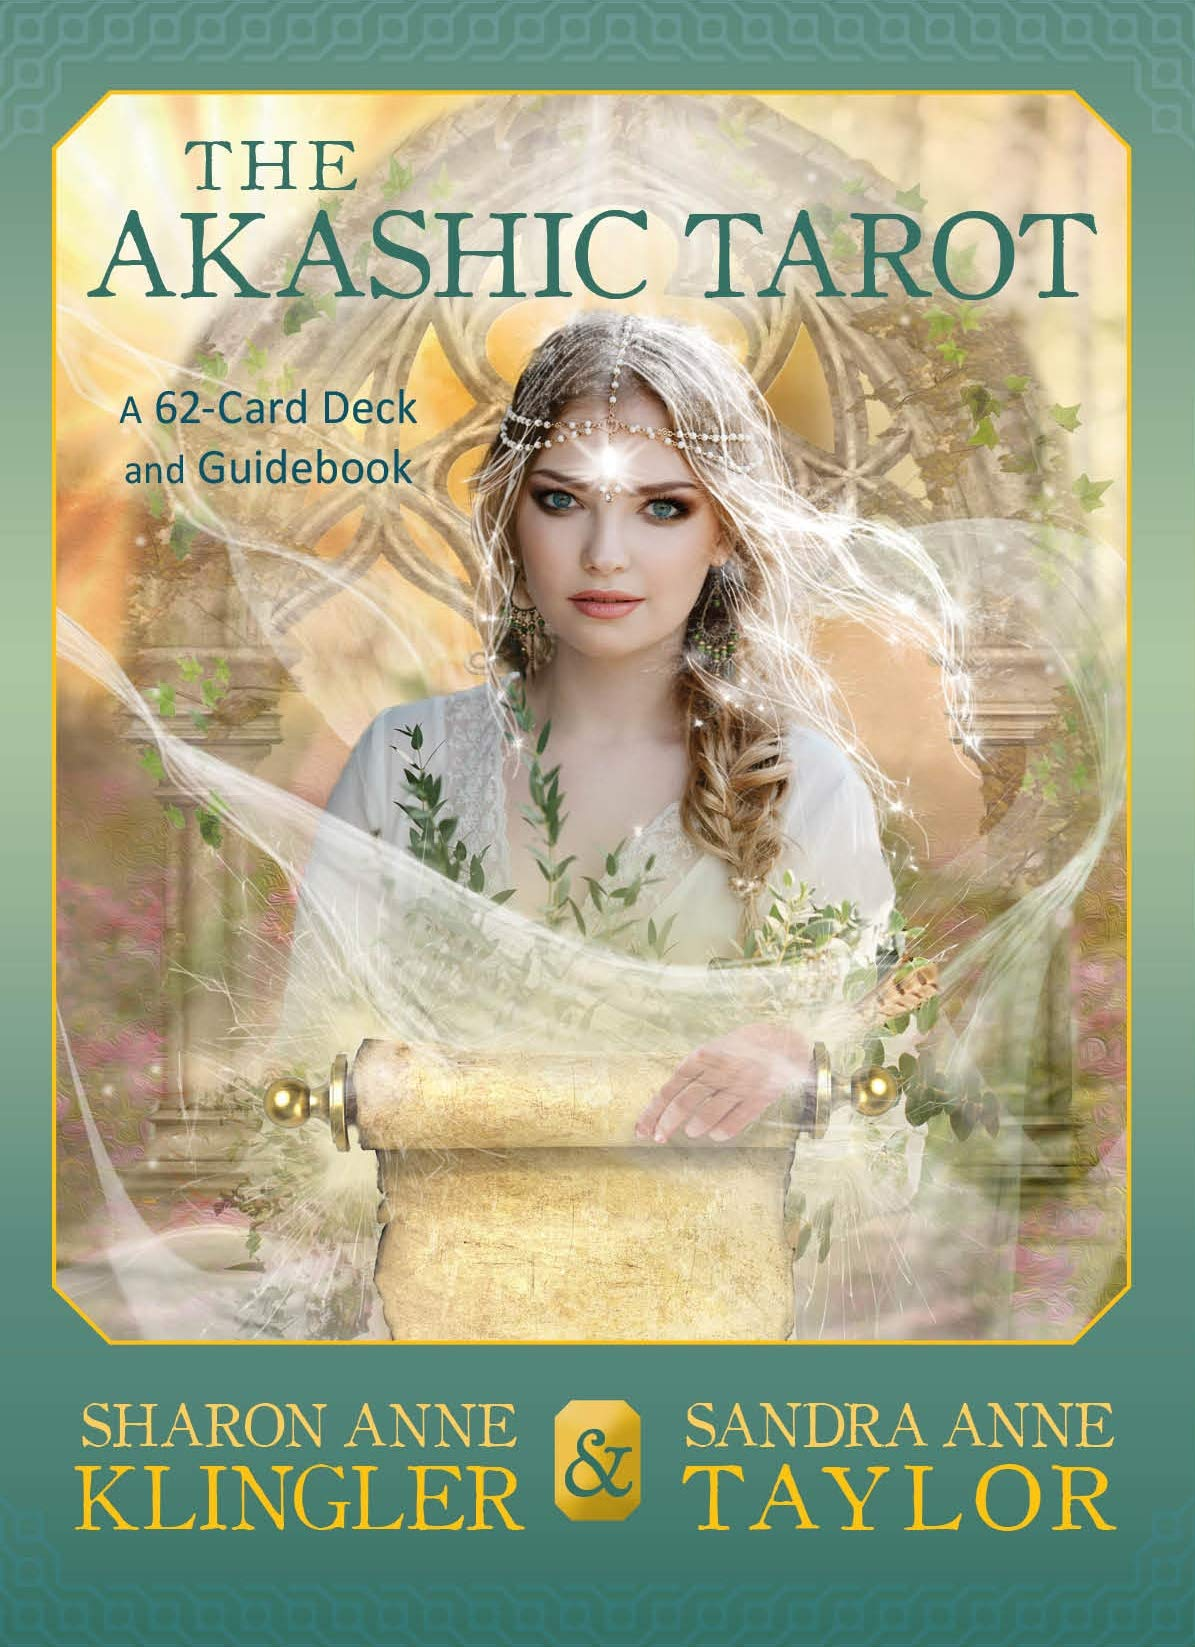 The Akashic Tarot: A 62-card Deck and Guidebook: Klingler, Sharon Anne, Taylor, Sandra Anne: 9781401950446: Amazon.com: Books